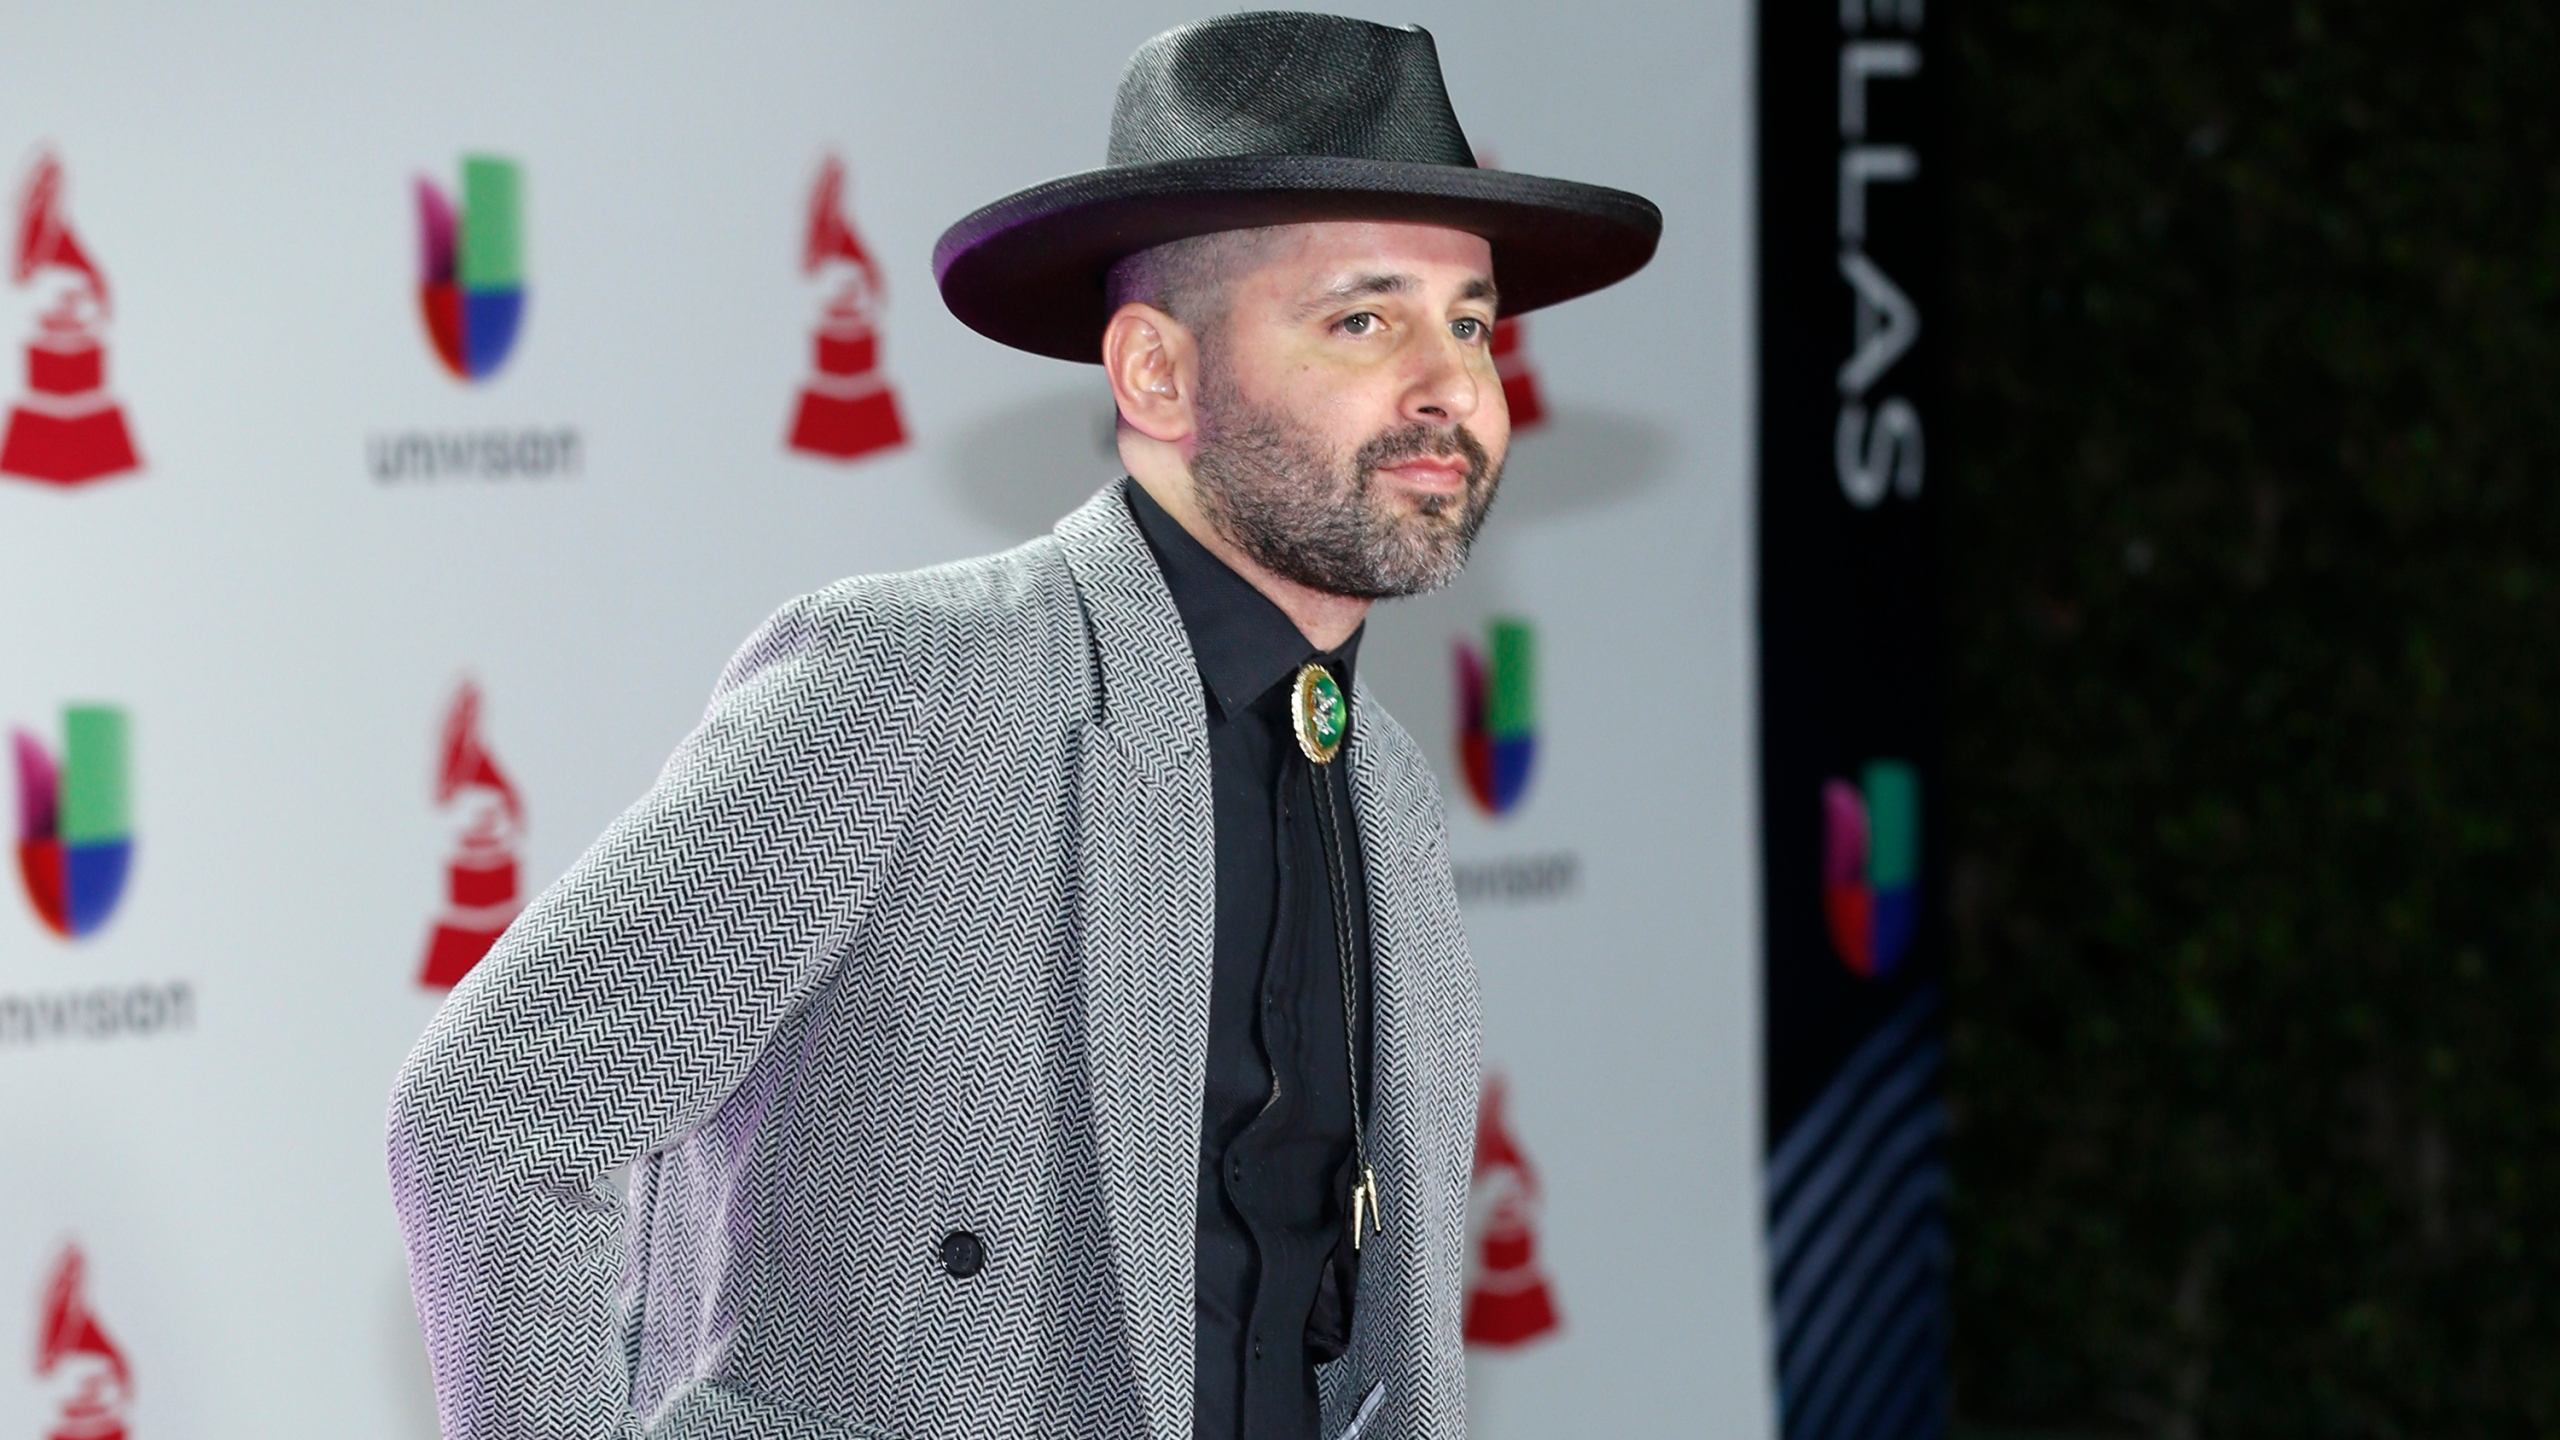 Visitante, Eduardo Cabra